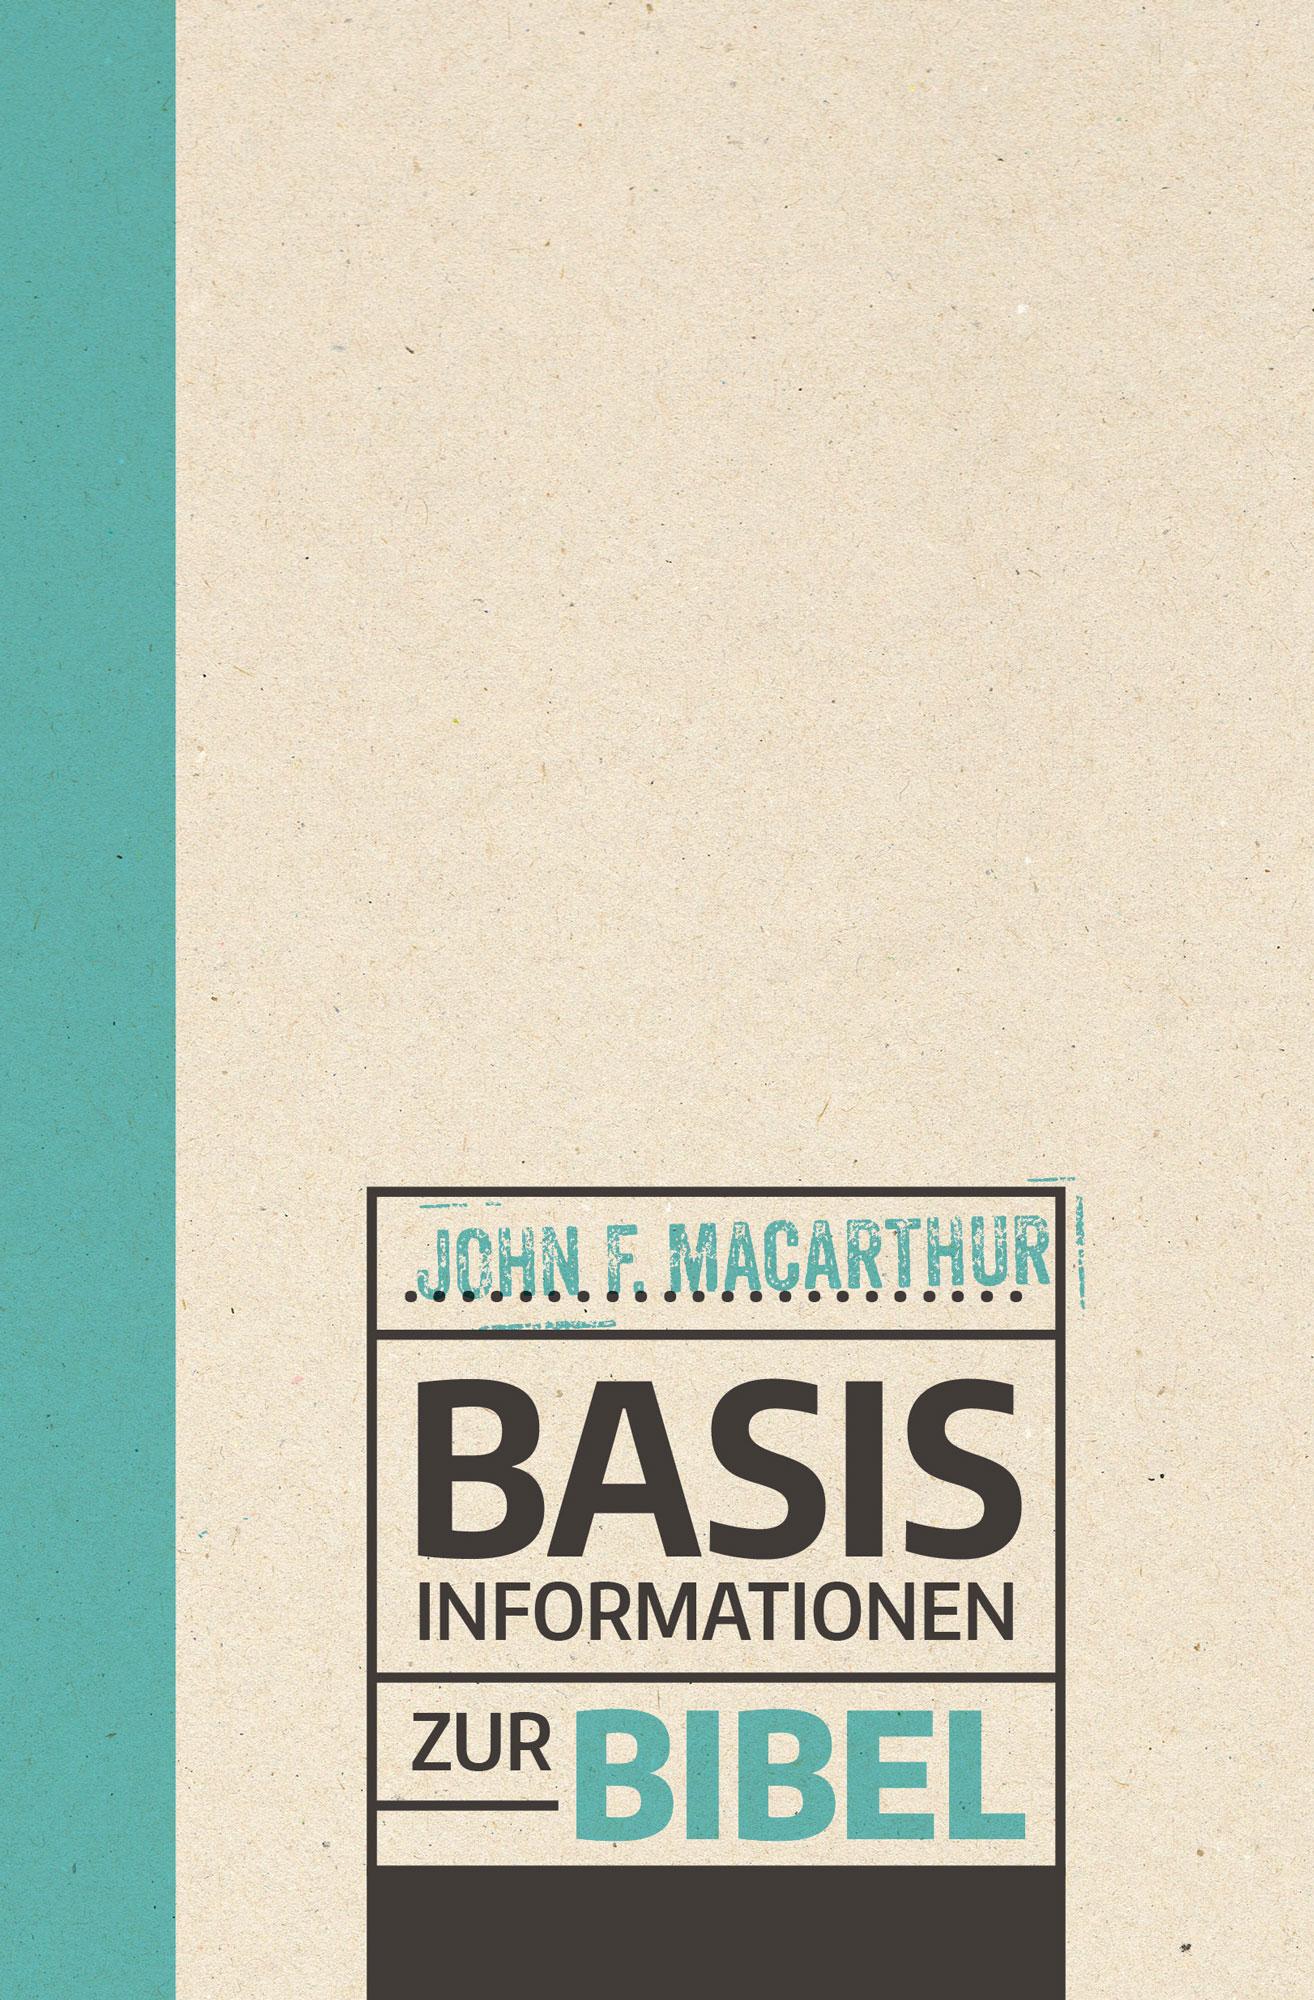 Basisinformationen zur Bibel